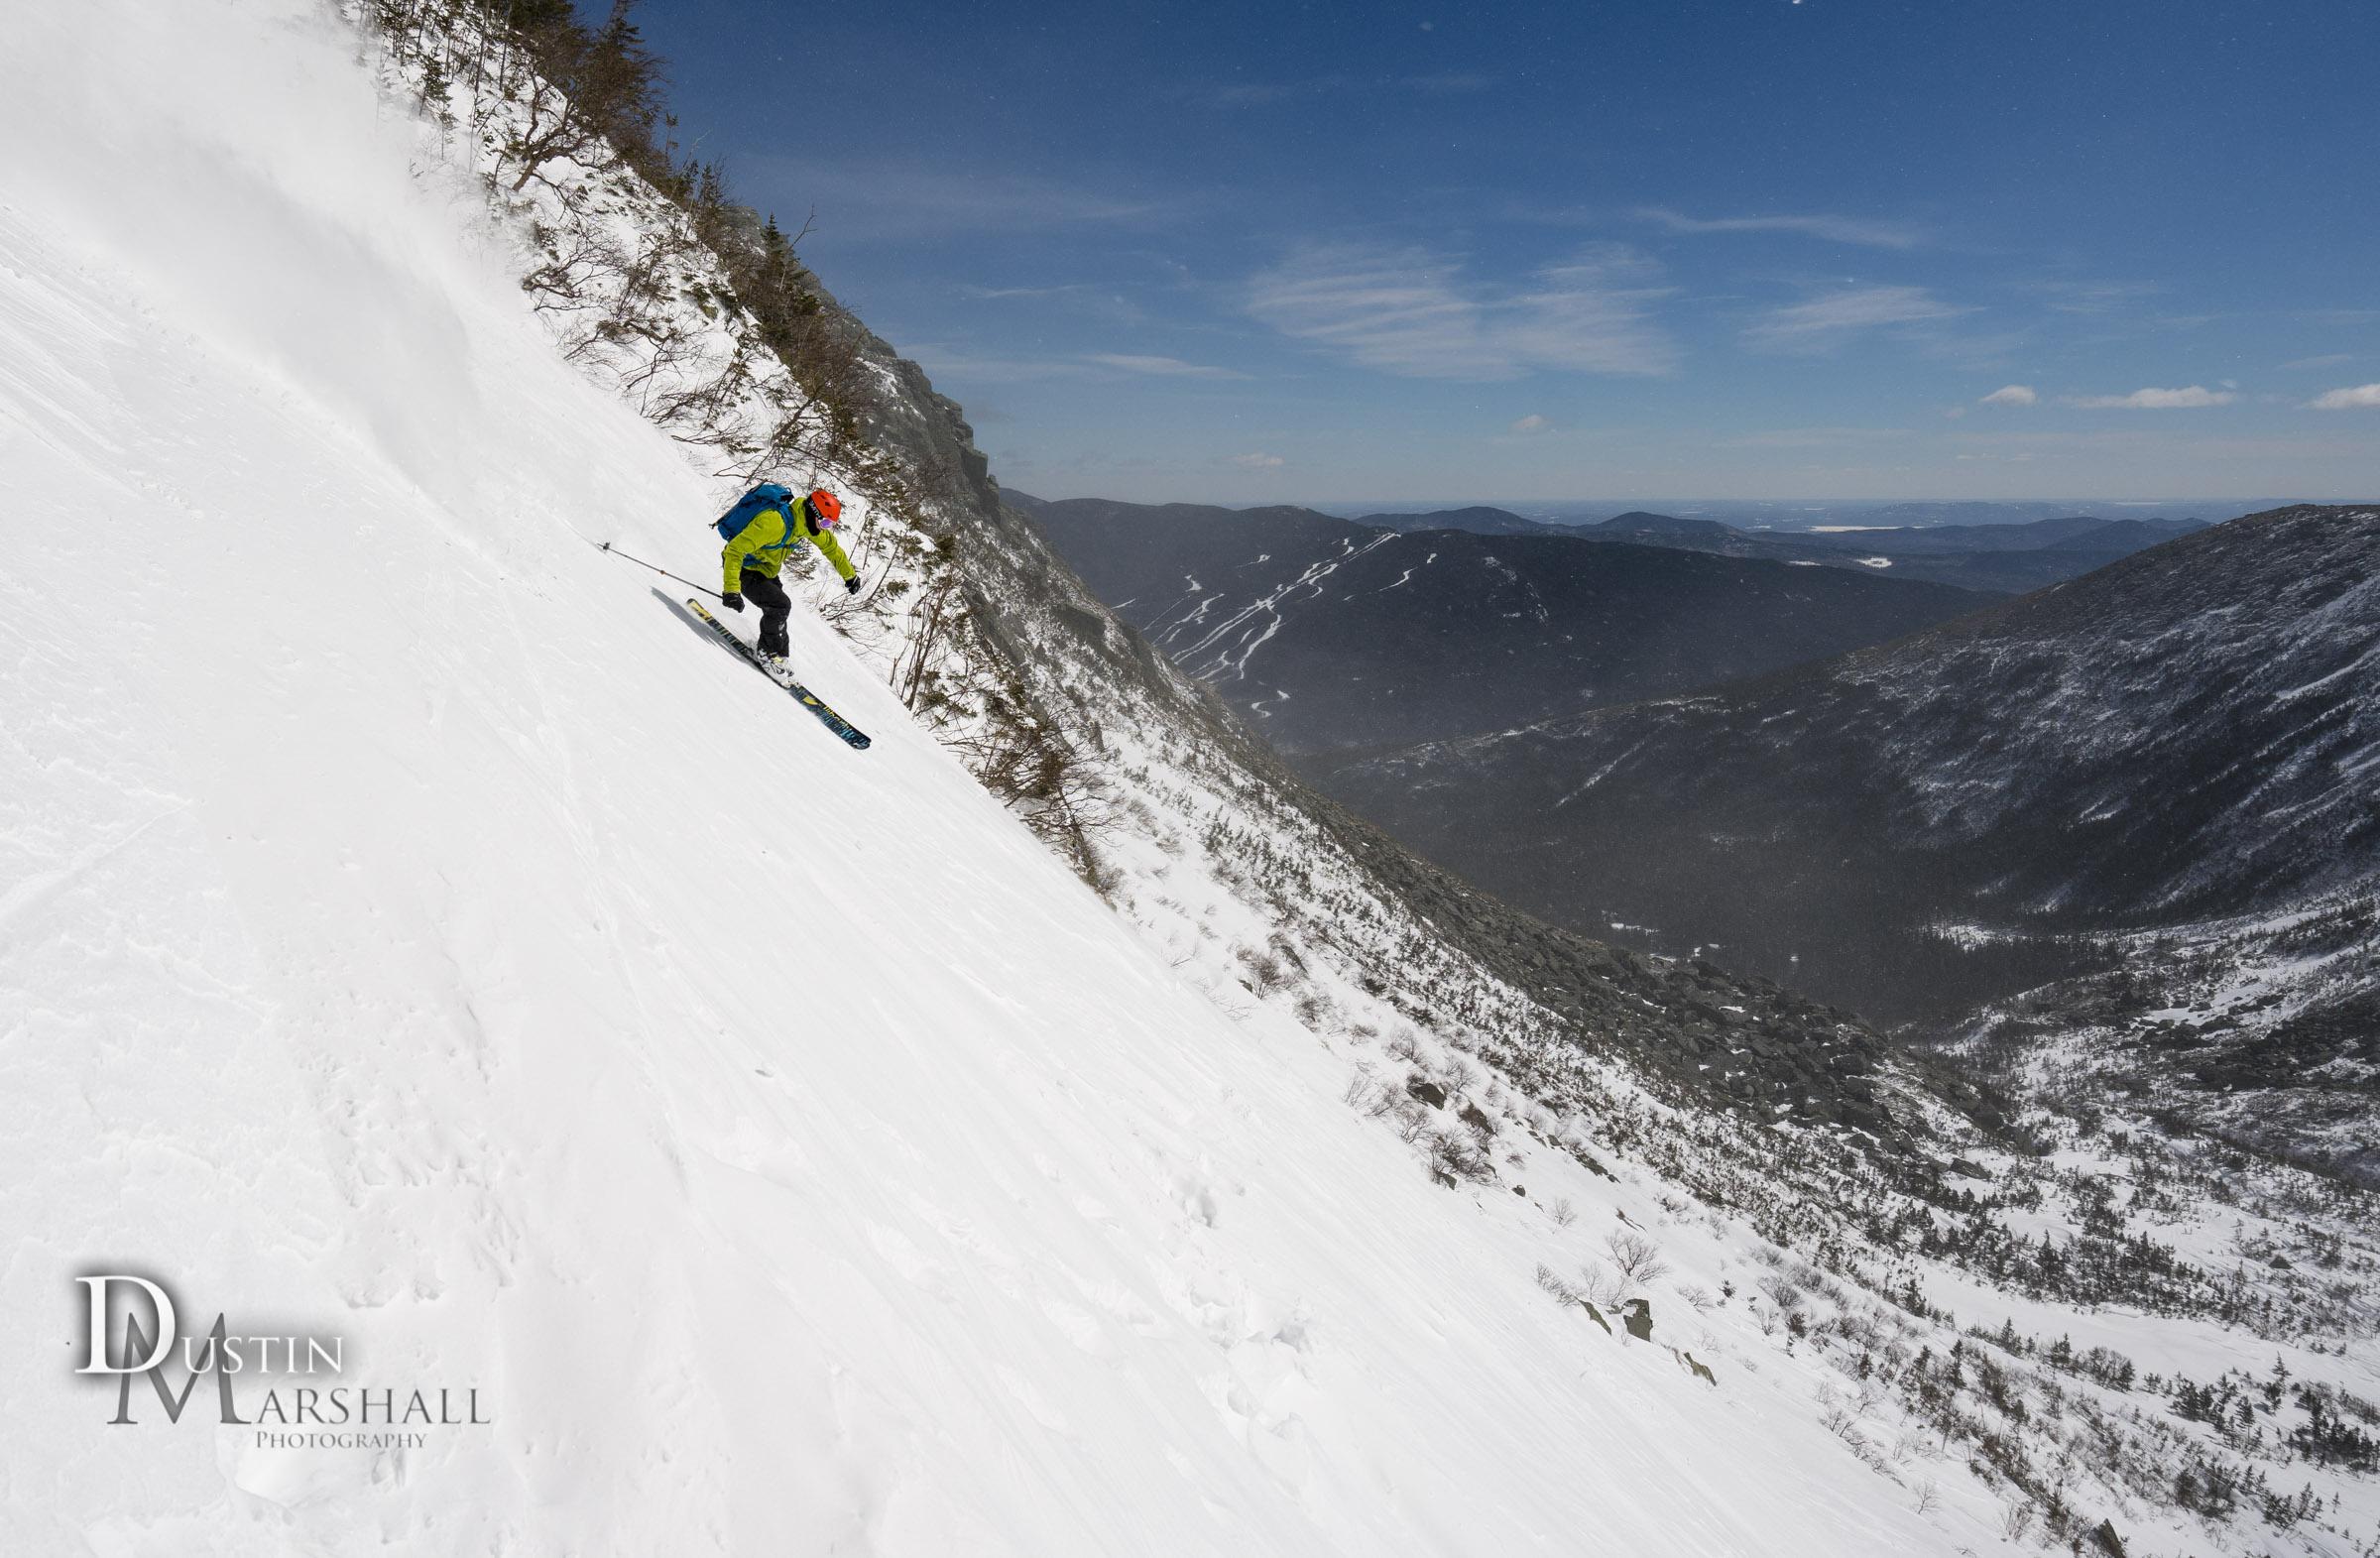 Skiing right gully in Tuckerman Ravine Mt Washington